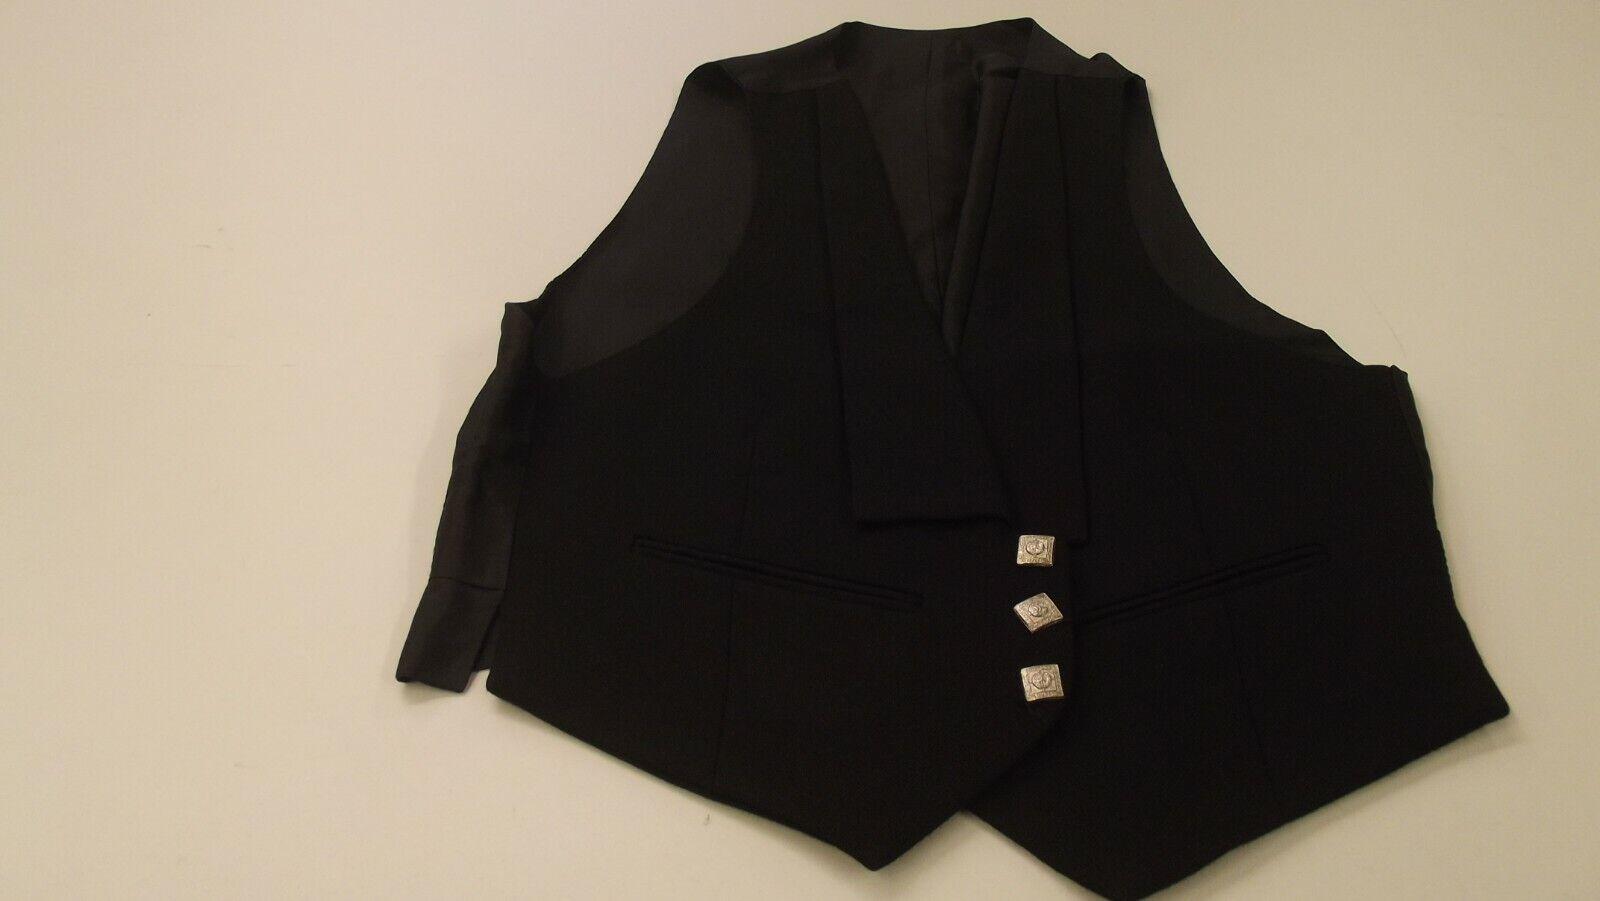 Ex-Hire 3 Button Black Prince Charlie Waistcoat - 34 Long 34L